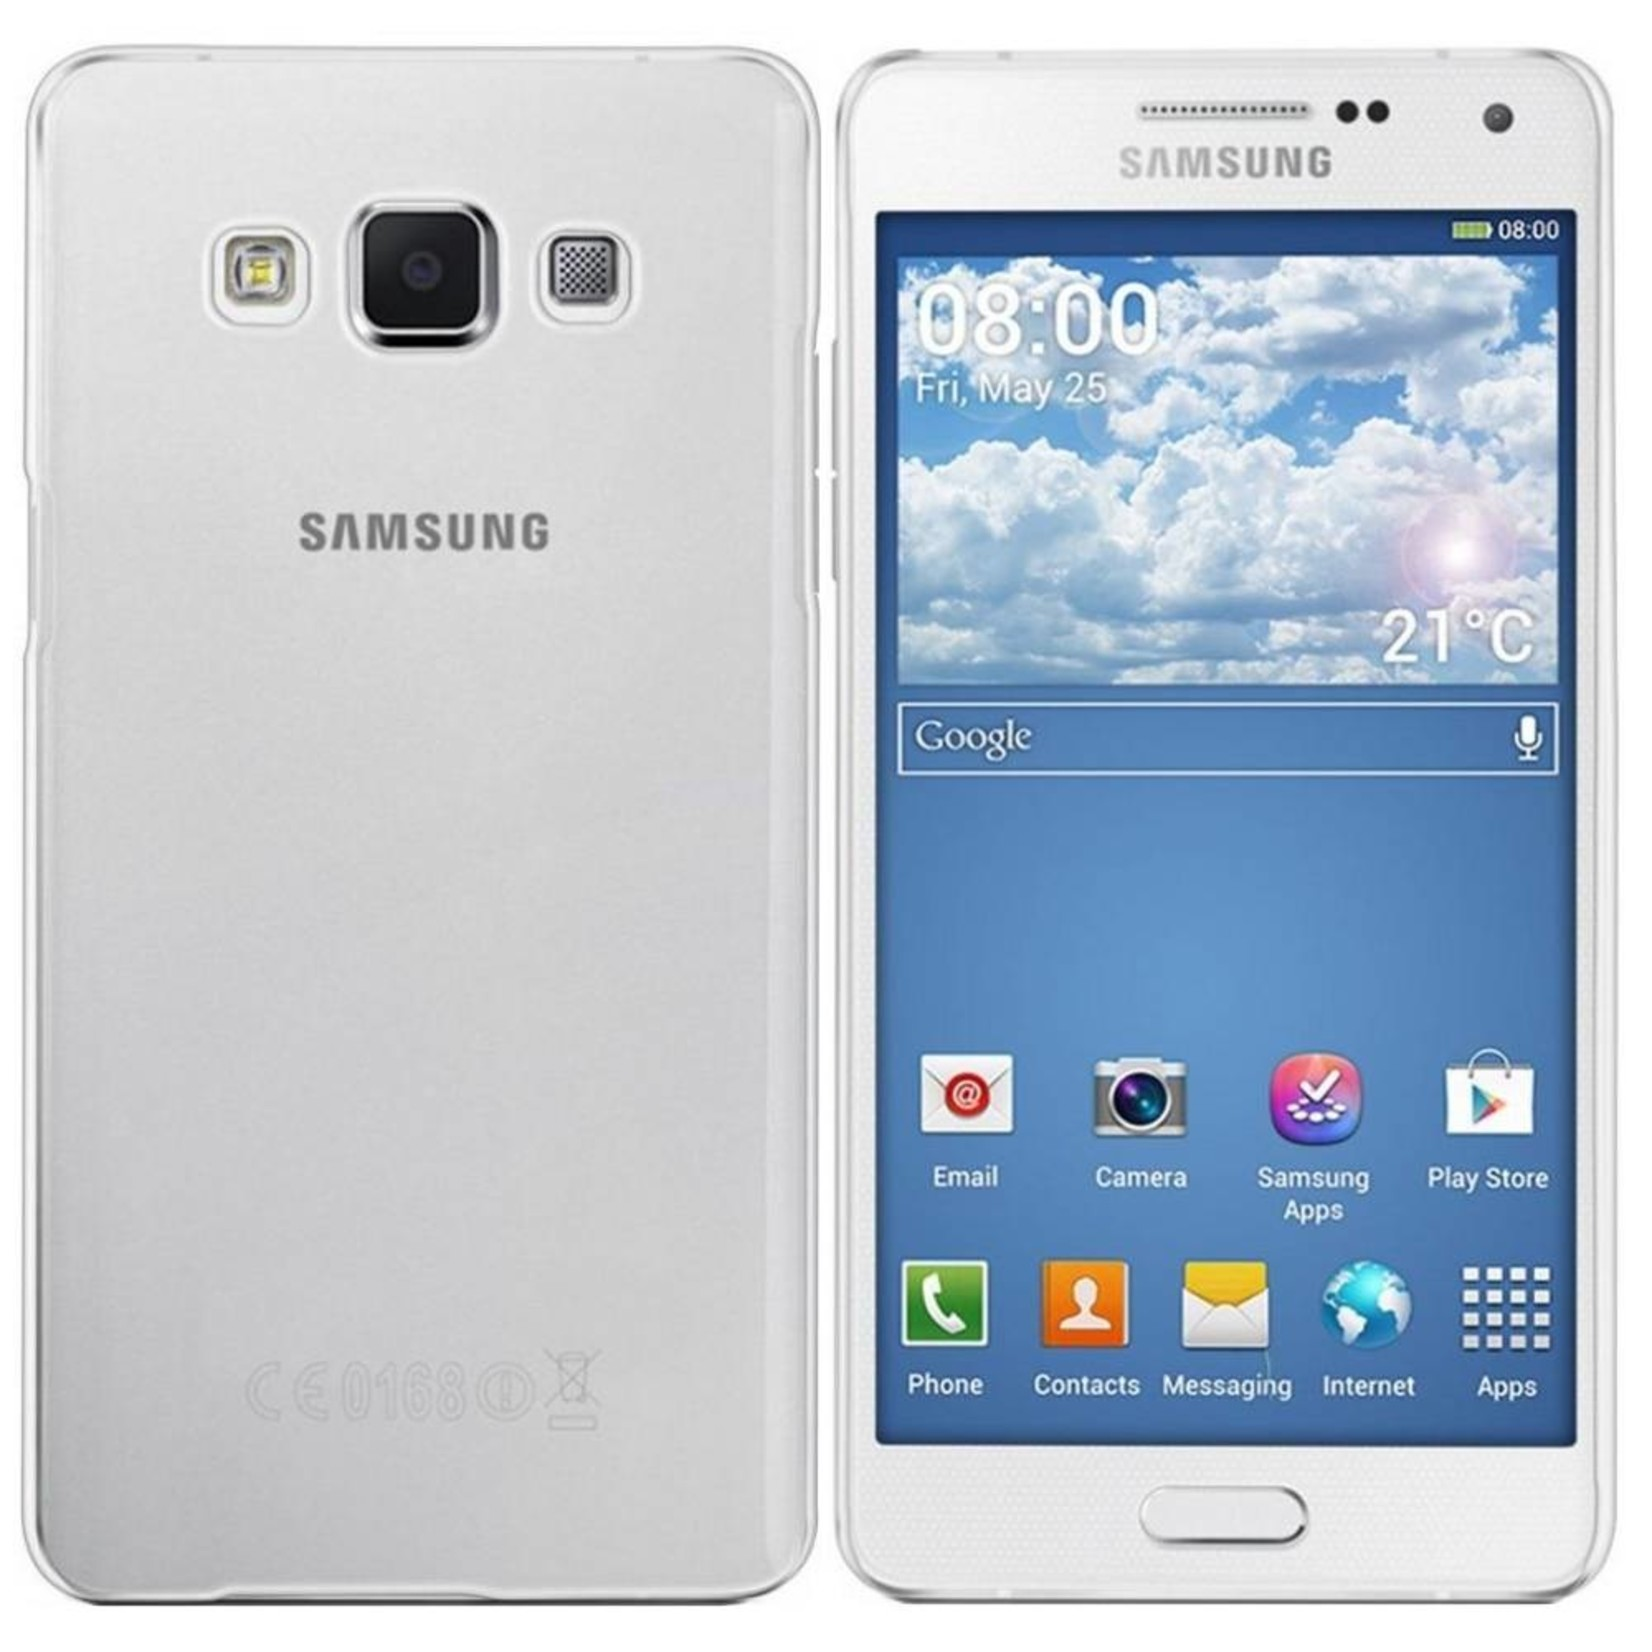 Colorfone Hoesje CoolSkin3T voor Samsung J1 2016 Transparant Wit